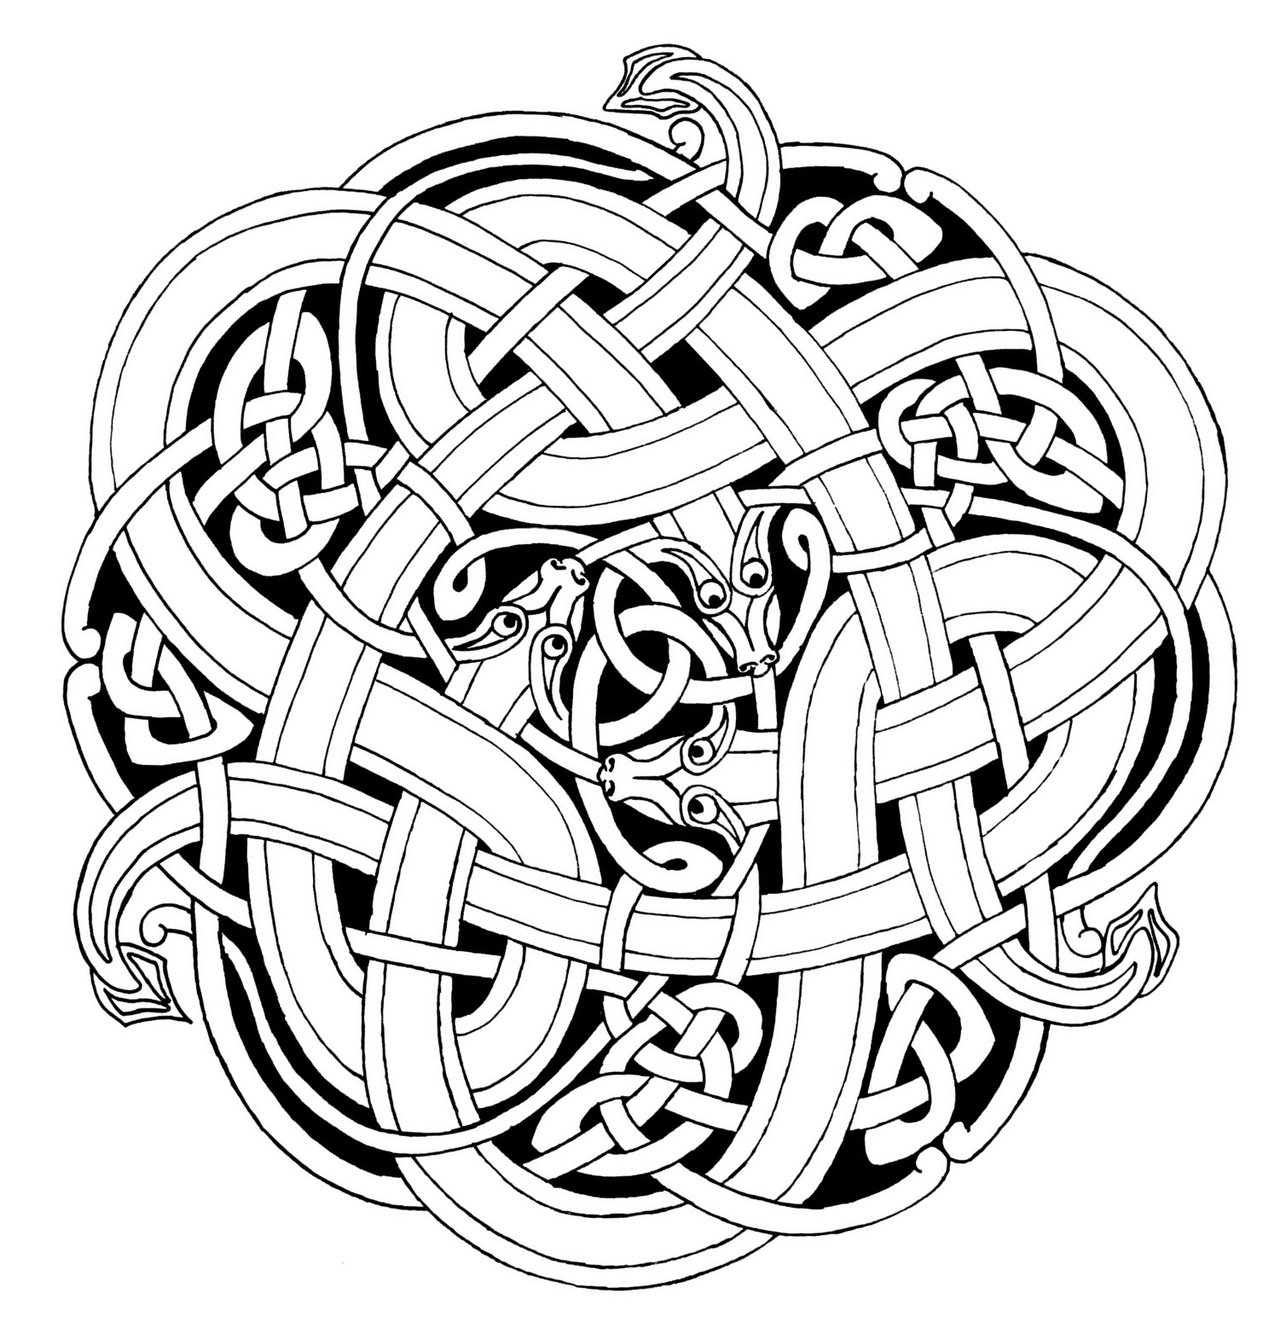 Drawn snake celtic knot Celtic @deviantART on Snakes com